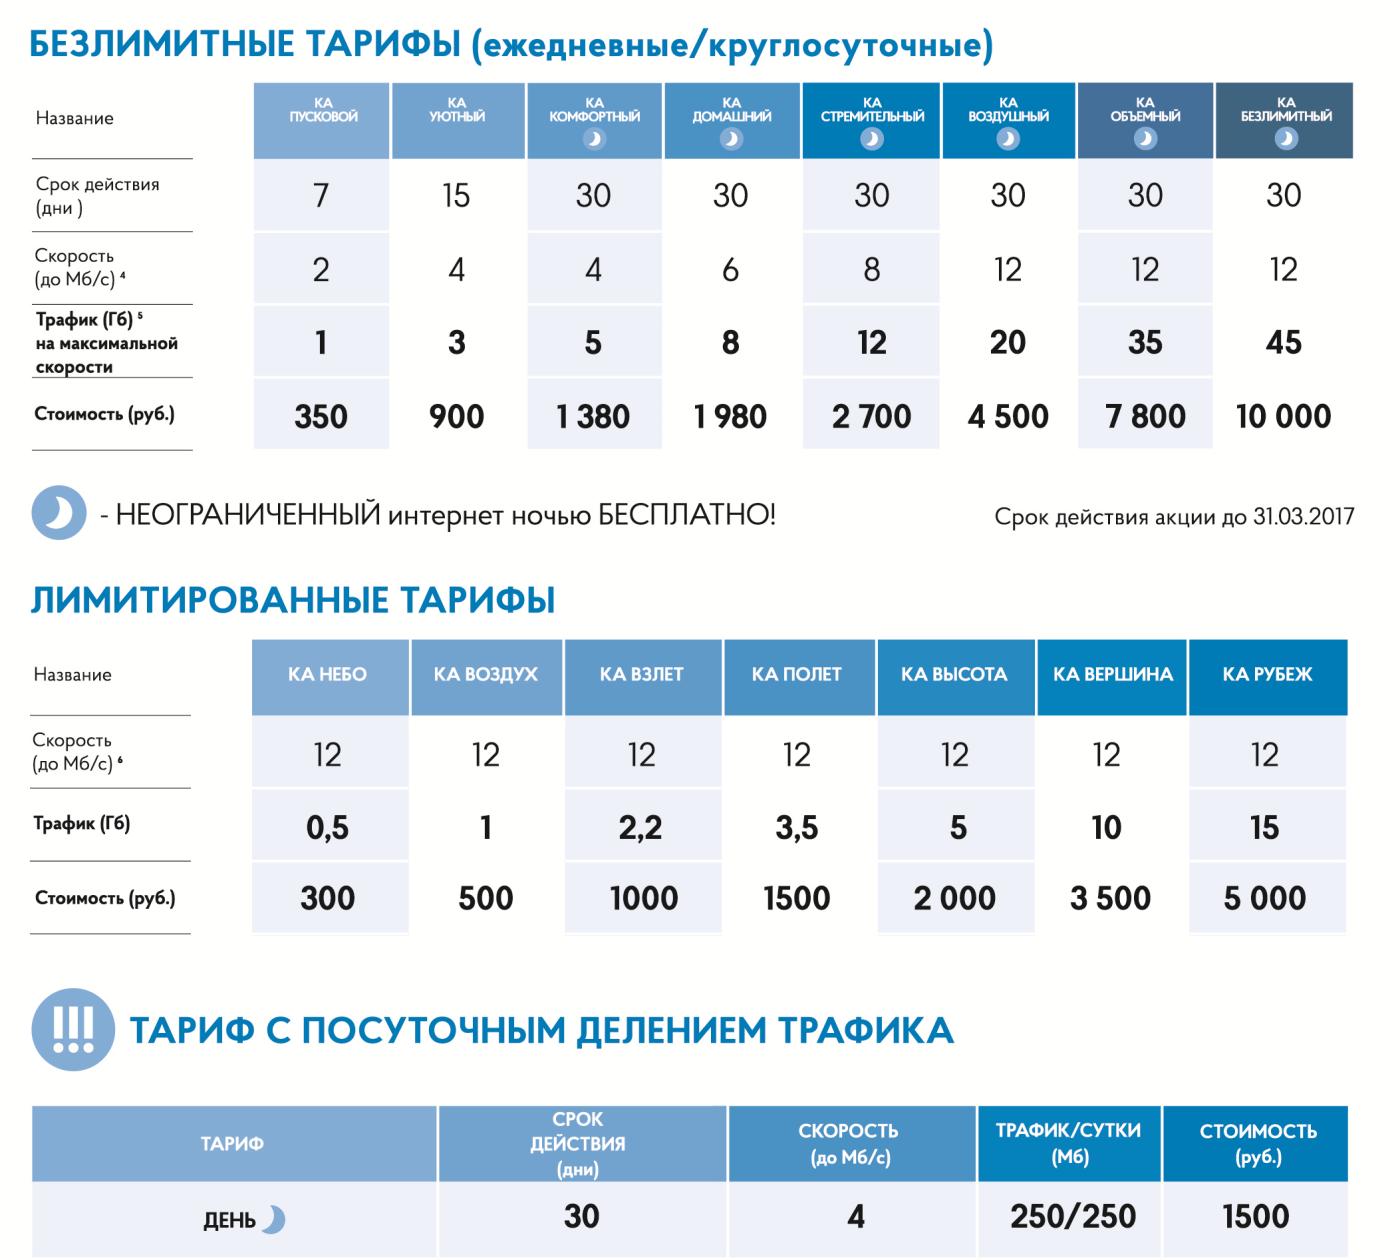 Zmu.тарифы_стриж.inettools.net.resize.image